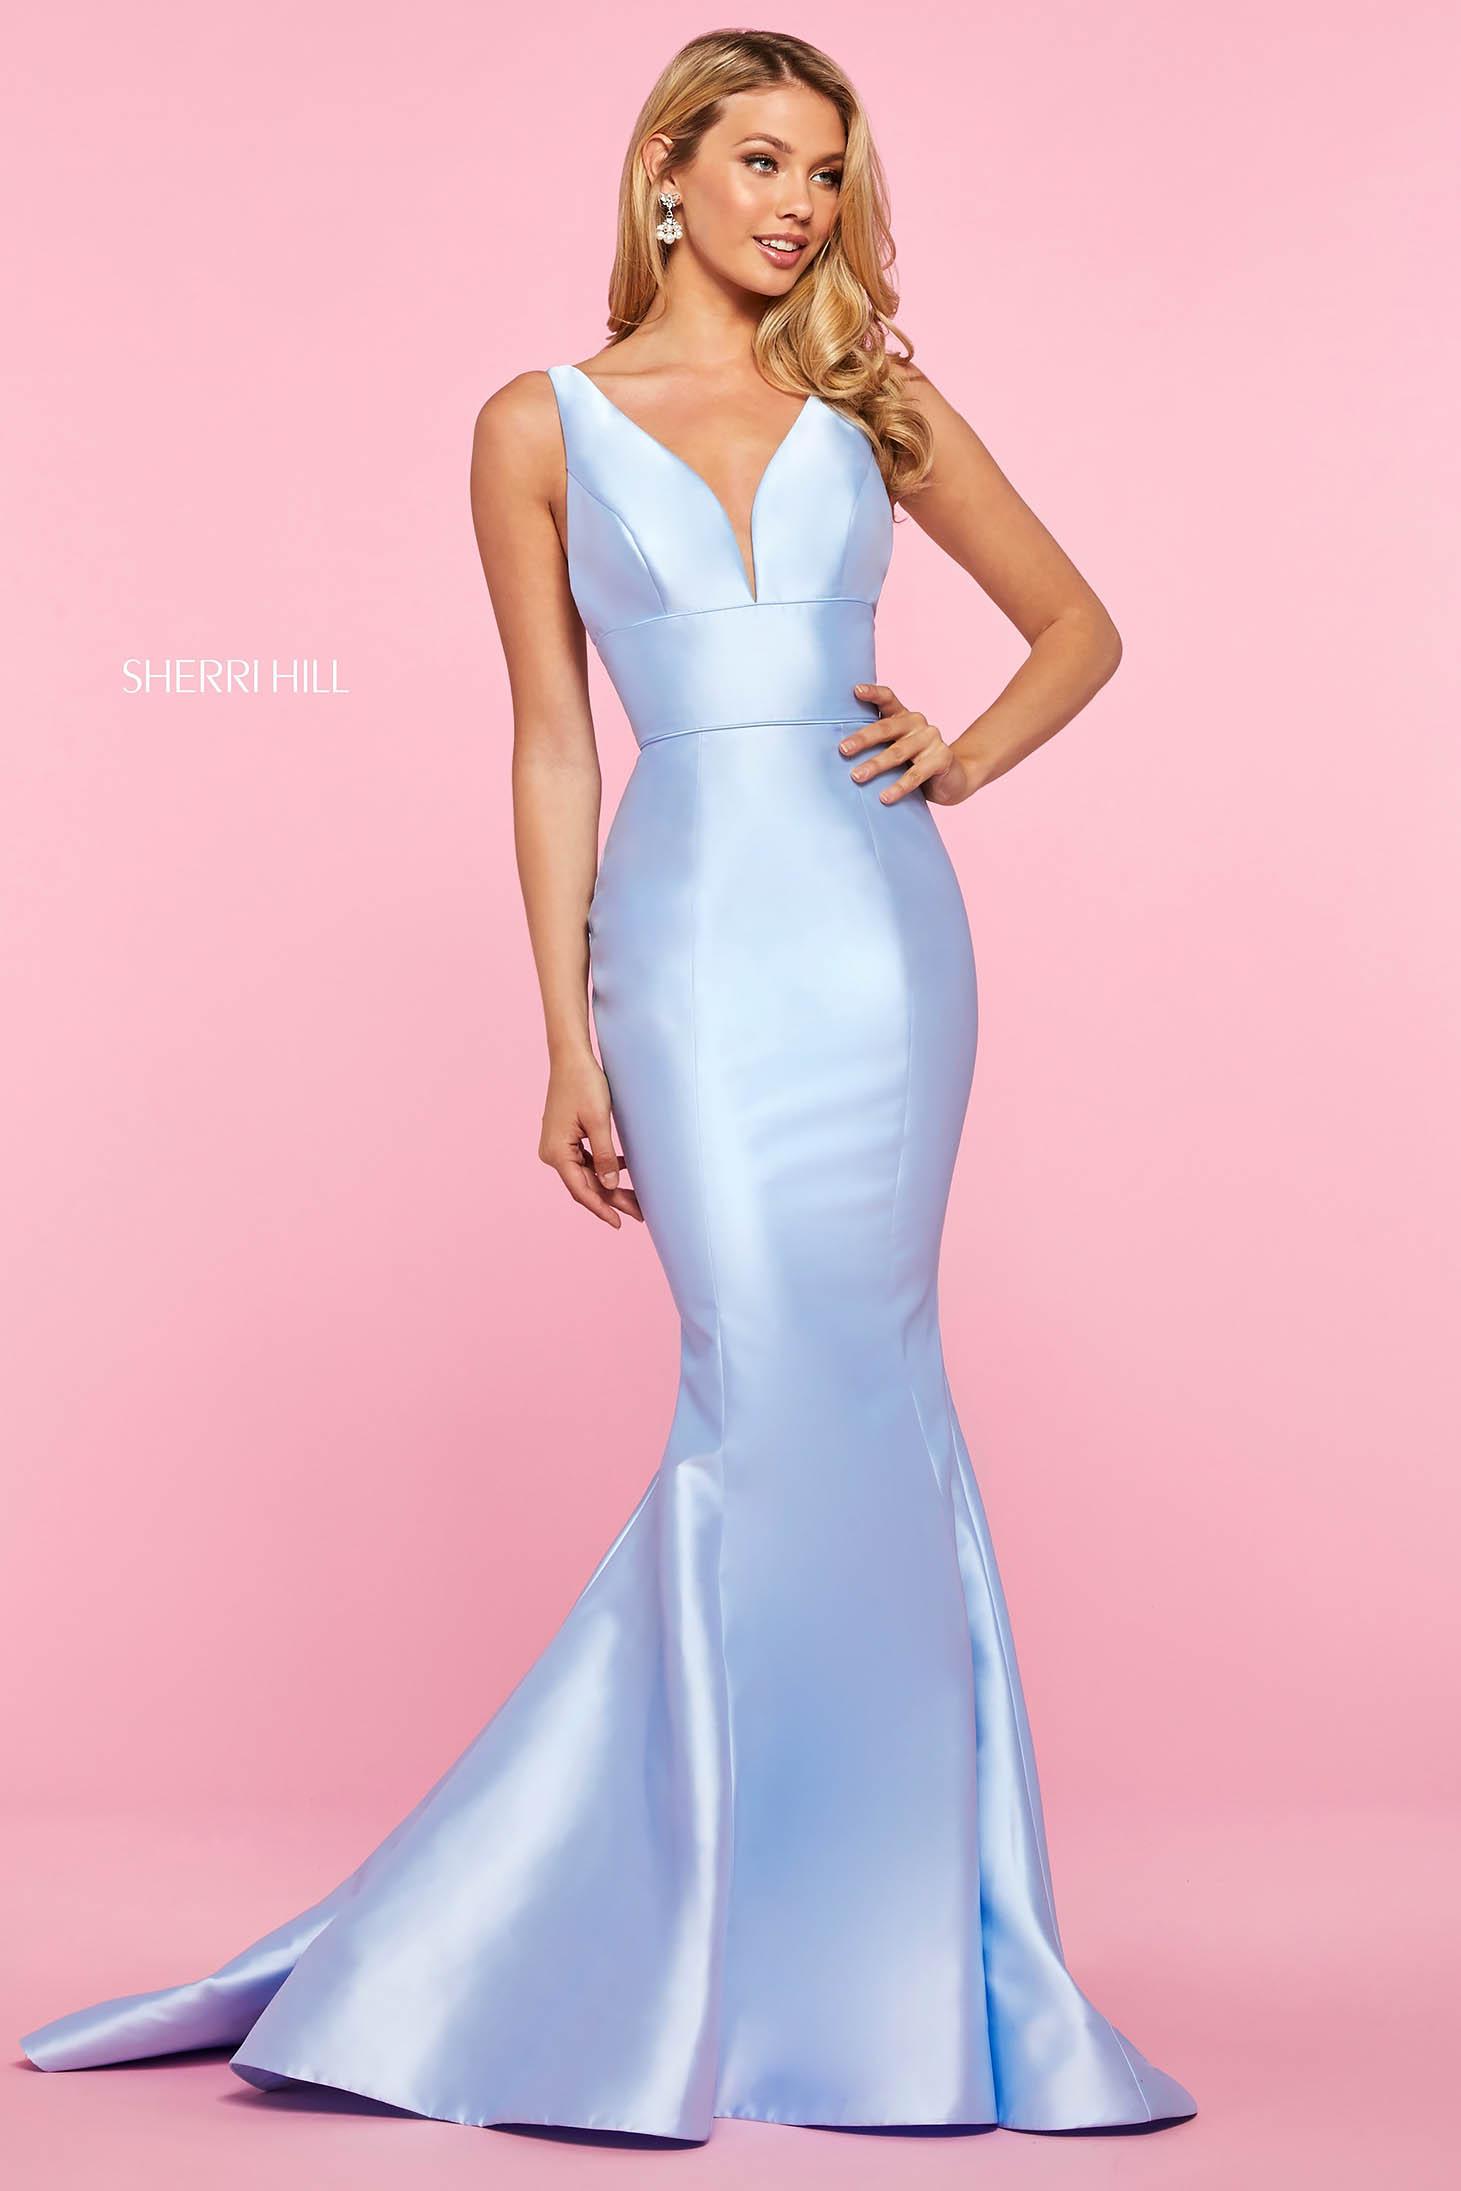 Rochie Sherri Hill 53660 light blue